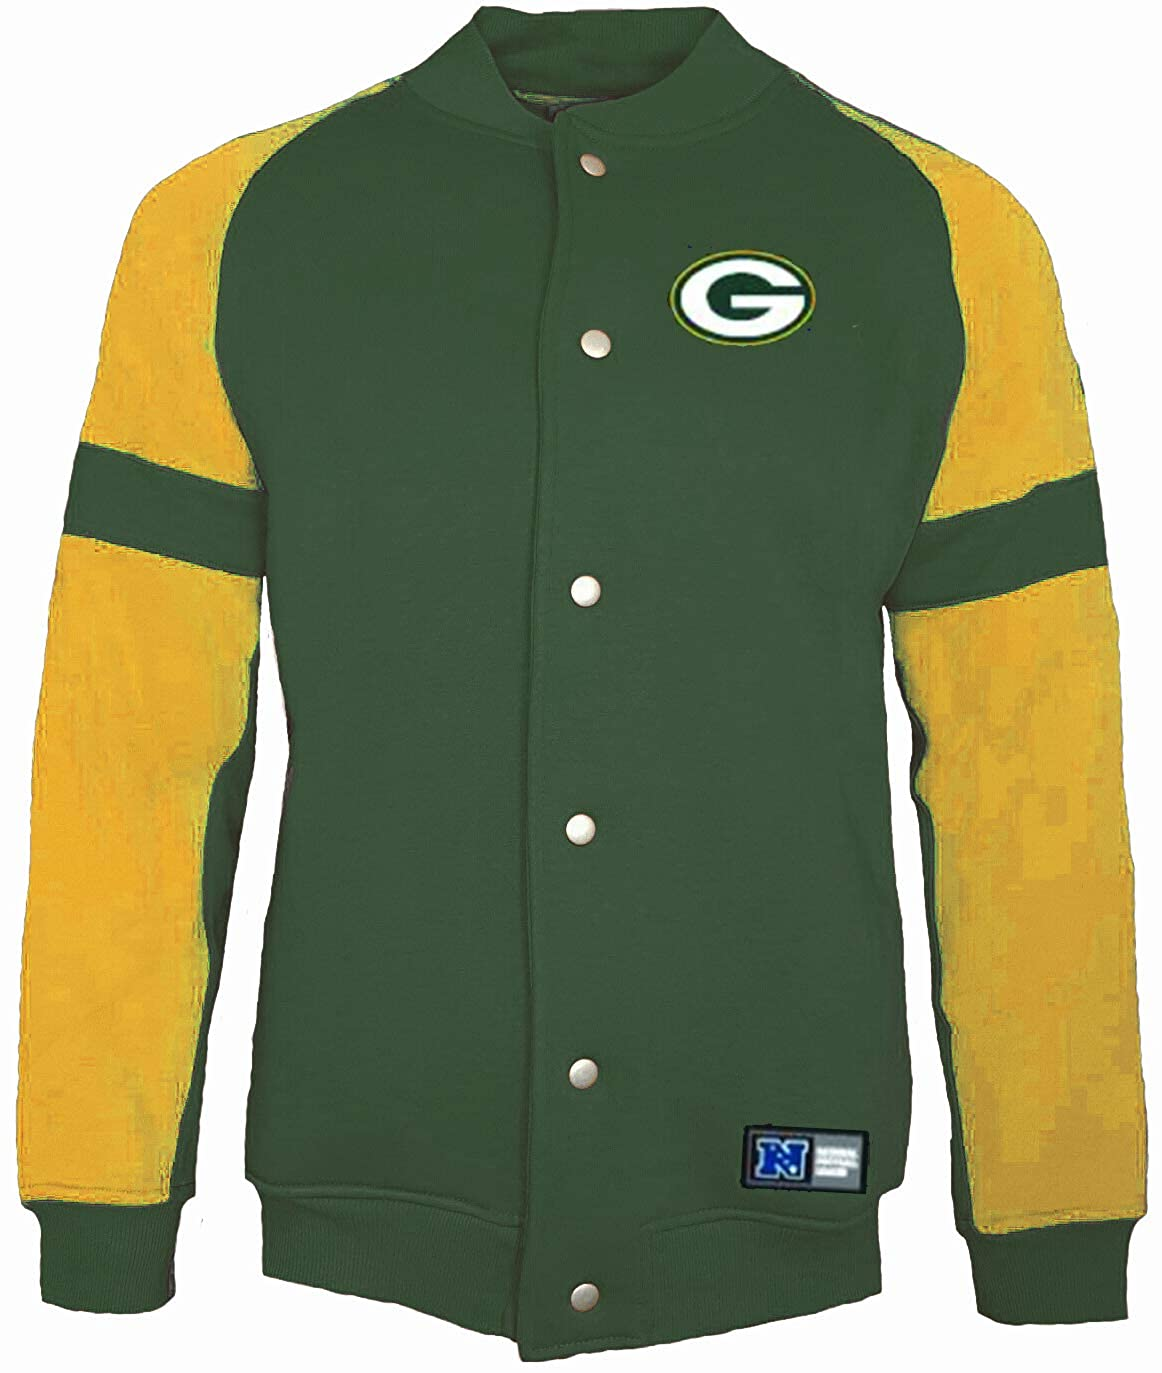 Majestic vert Bay Packers NFL Jeiter Veste Polaire Letterhomme